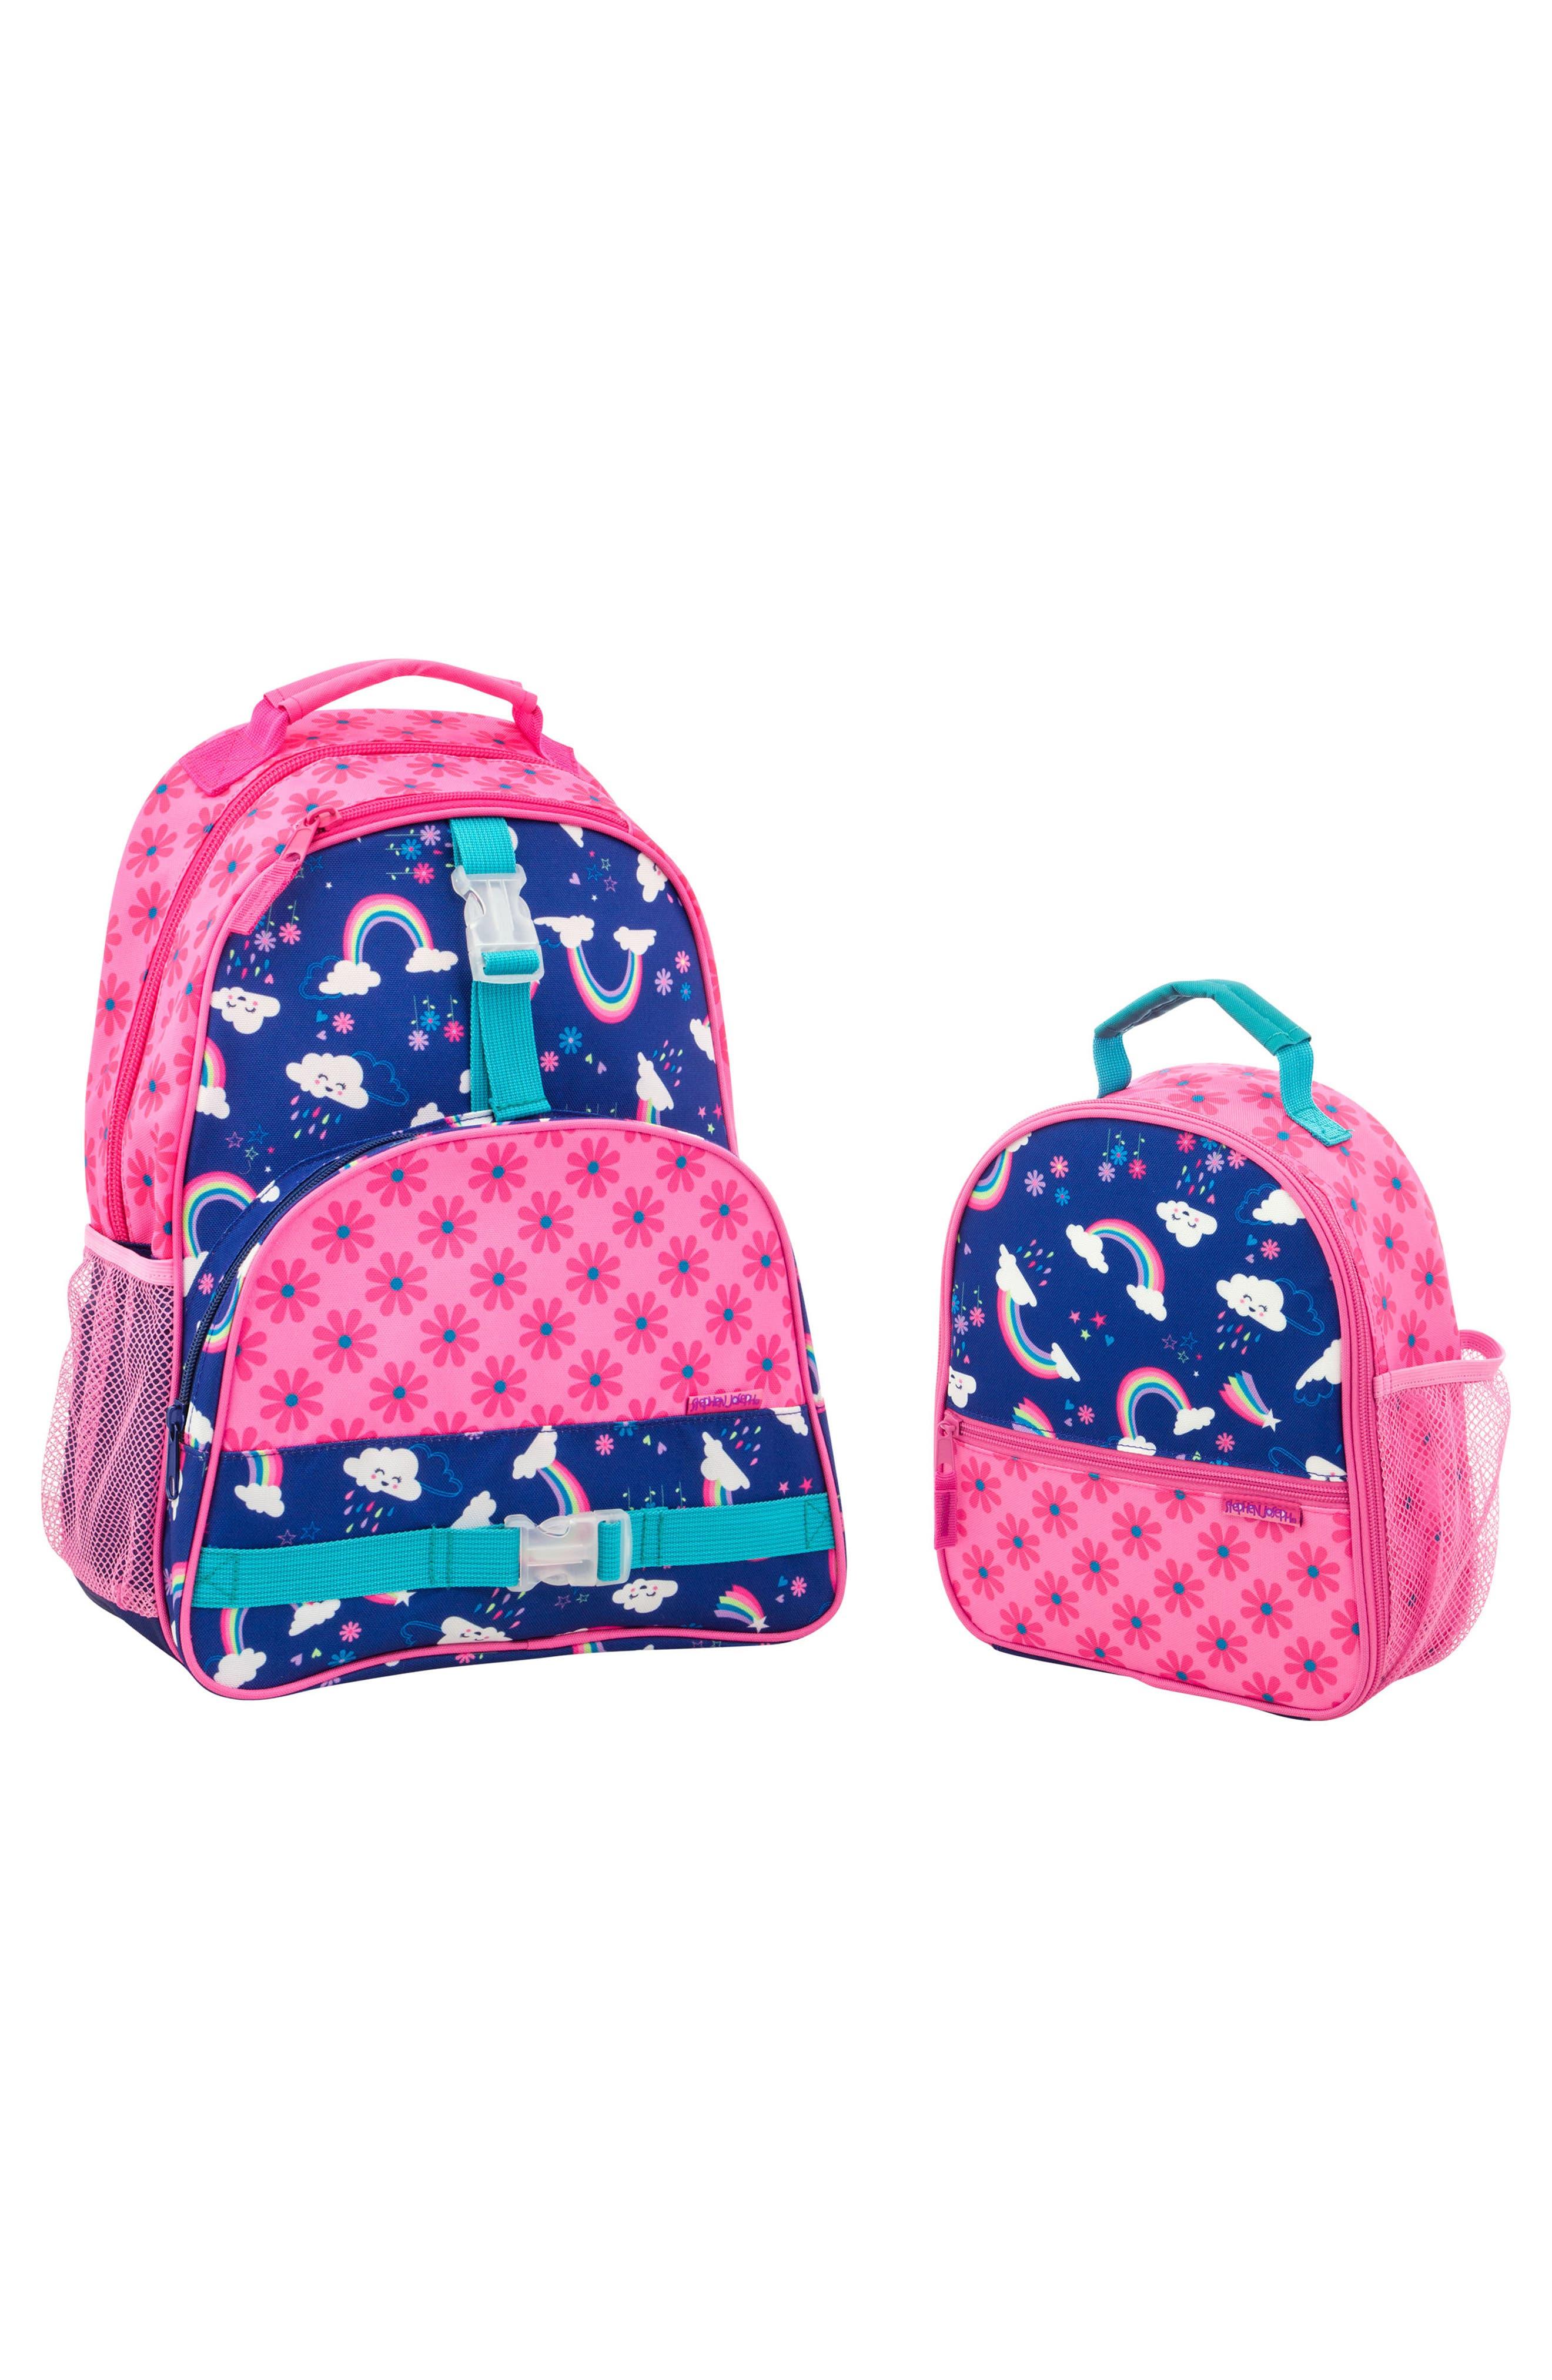 Girls Stephen Joseph Mermaid Sidekick Backpack  Lunch Pal  Blue